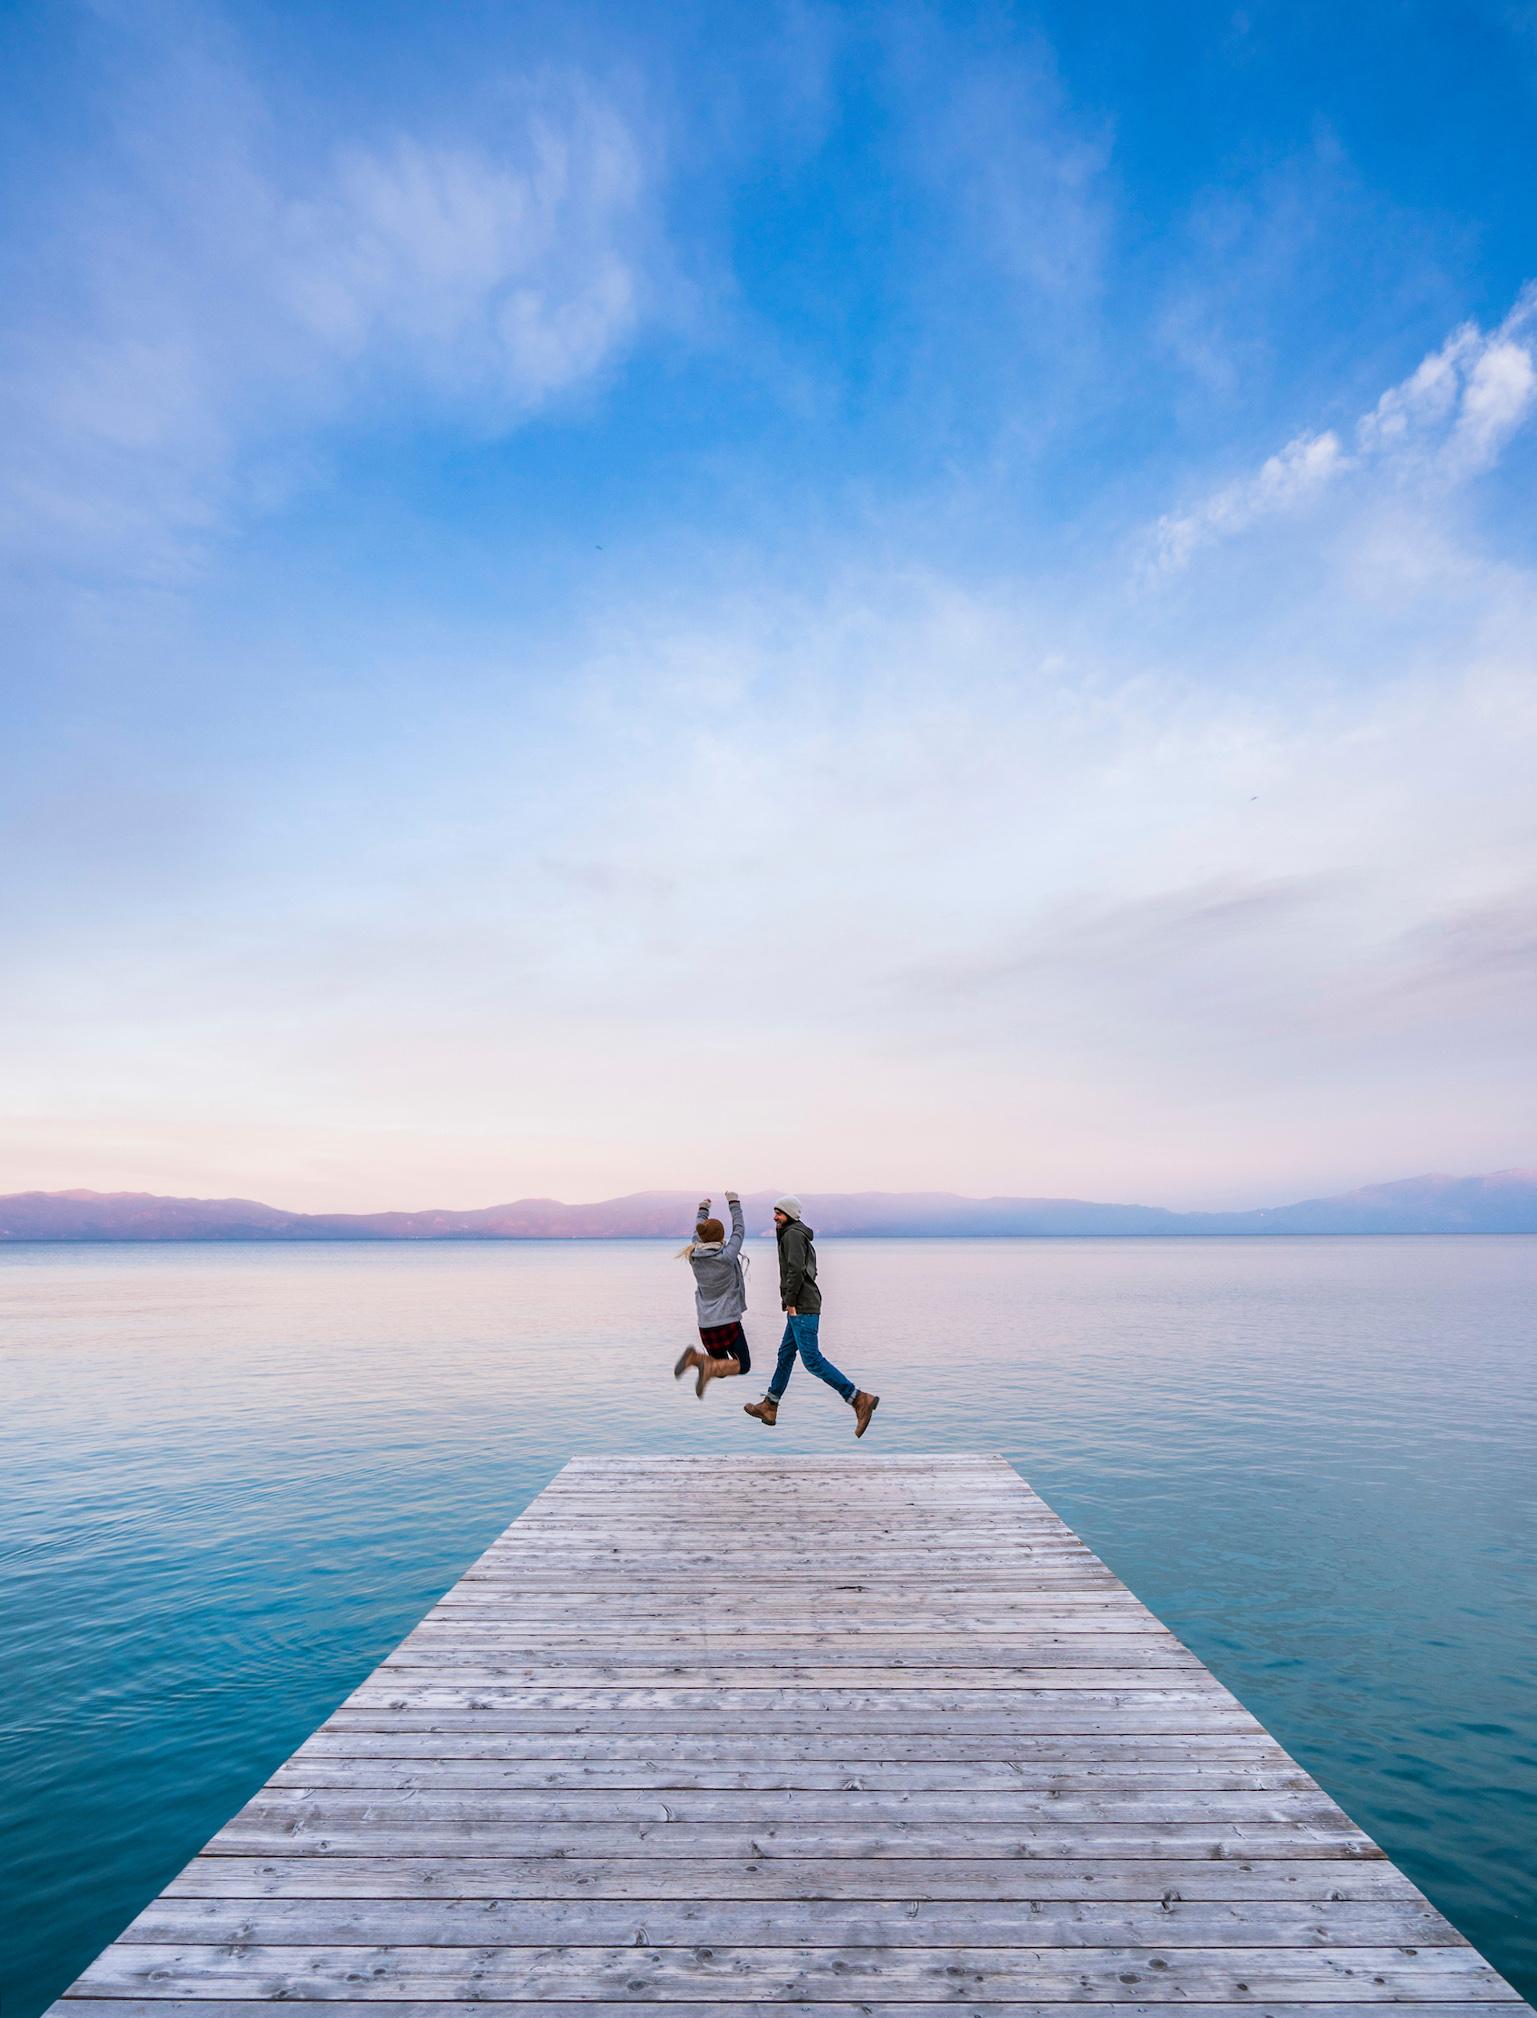 Sugar Pine State Park, Lake Tahoe, California